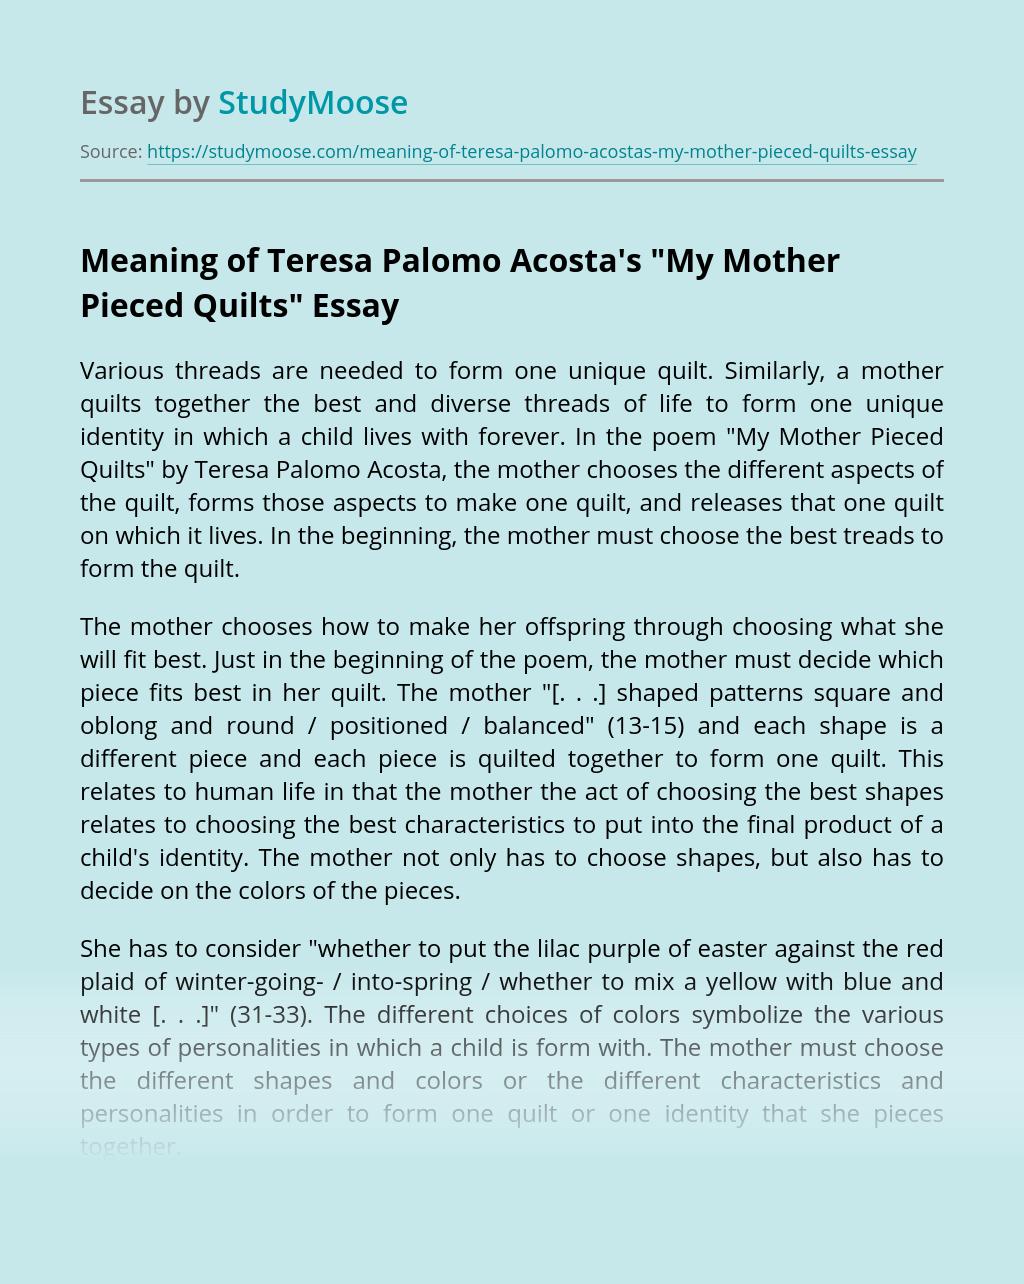 Meaning of Teresa Palomo Acosta's